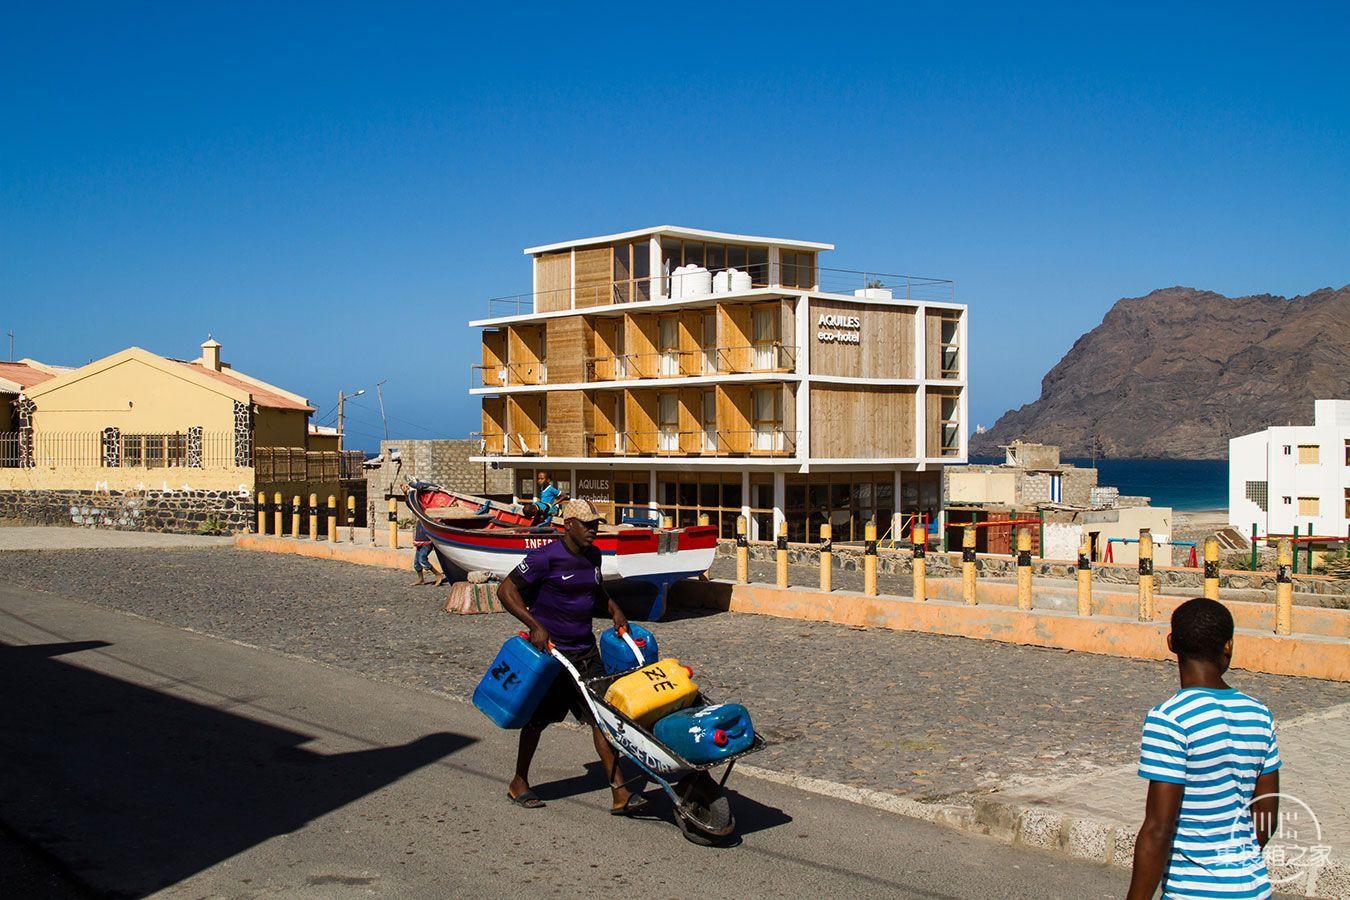 acquiles_eco_hotel_06_Ramos_Castellano_Architects.jpg